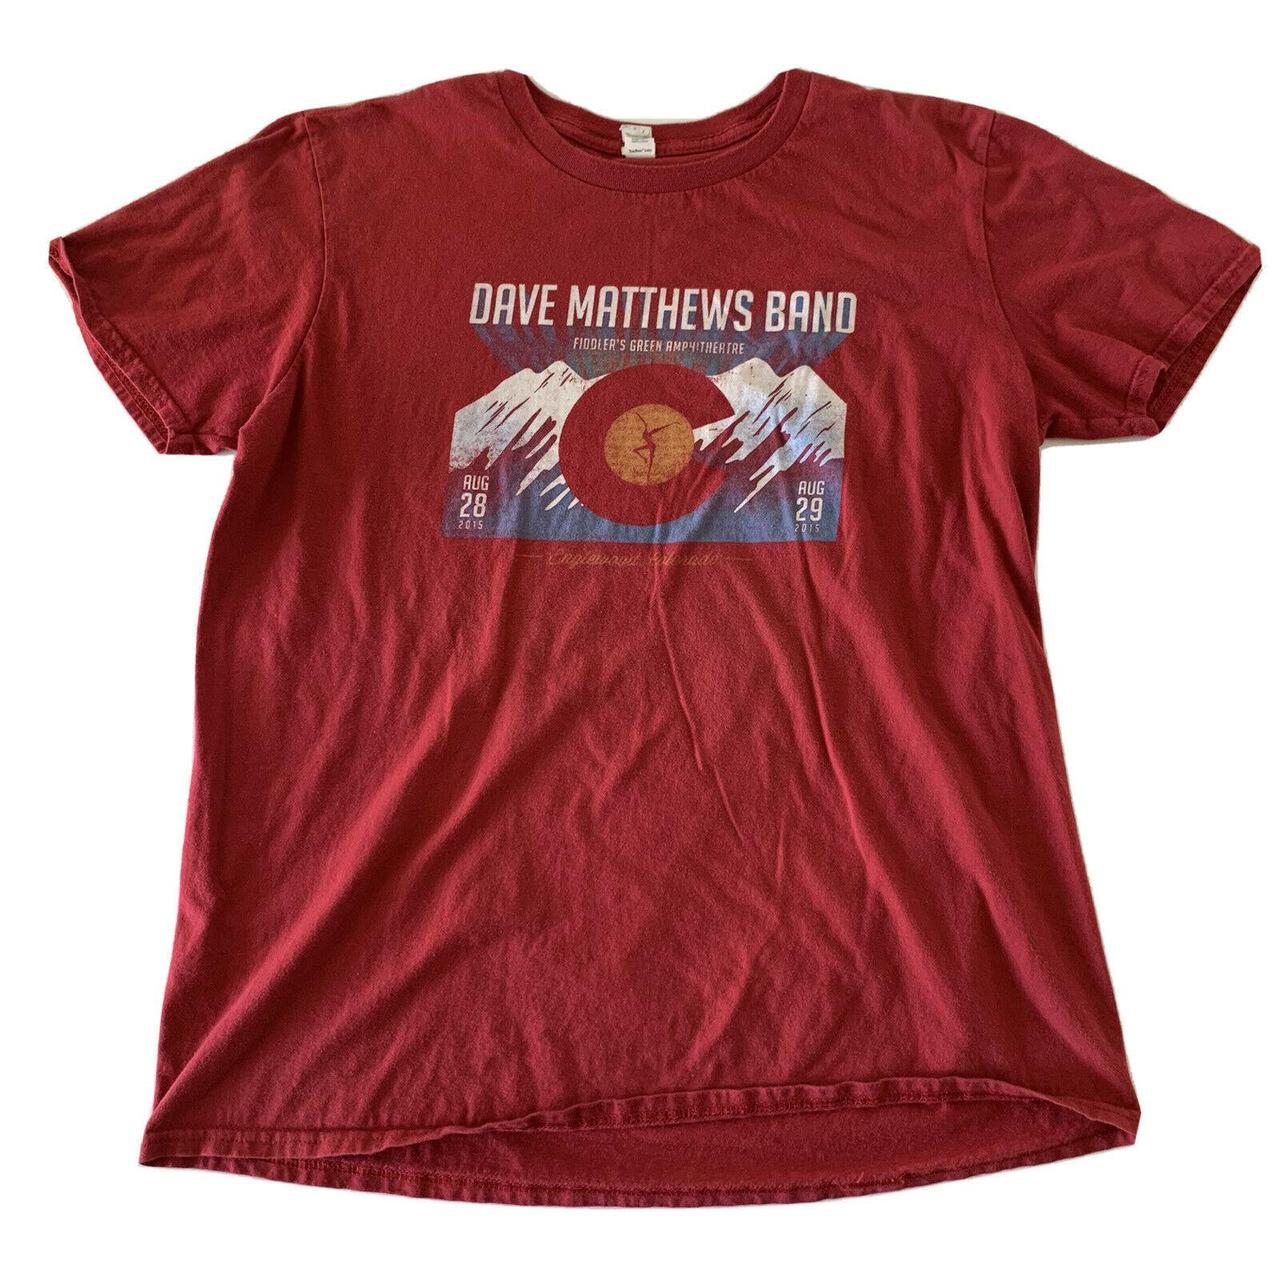 Product Image 1 - Dave Mathews Band Colorado 2015